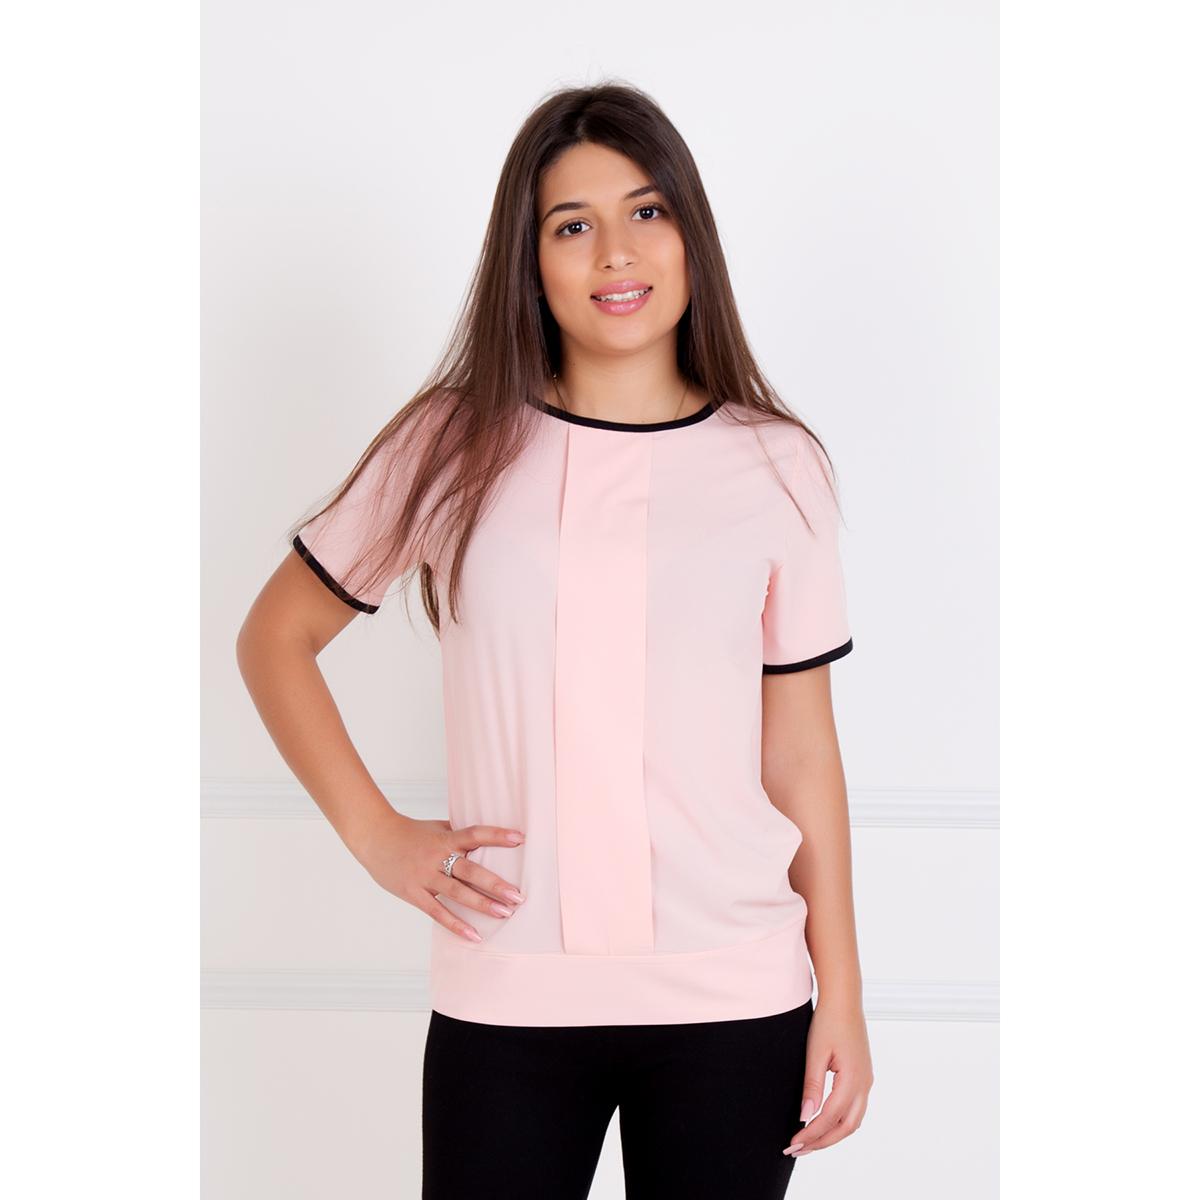 Женская блуза Кира Персиковый, размер 54Блузы<br>Обхват груди: 108 см <br>Обхват талии: 88 см <br>Обхват бедер: 116 см <br>Рост: 167 см<br><br>Тип: Жен. блуза<br>Размер: 54<br>Материал: Креп